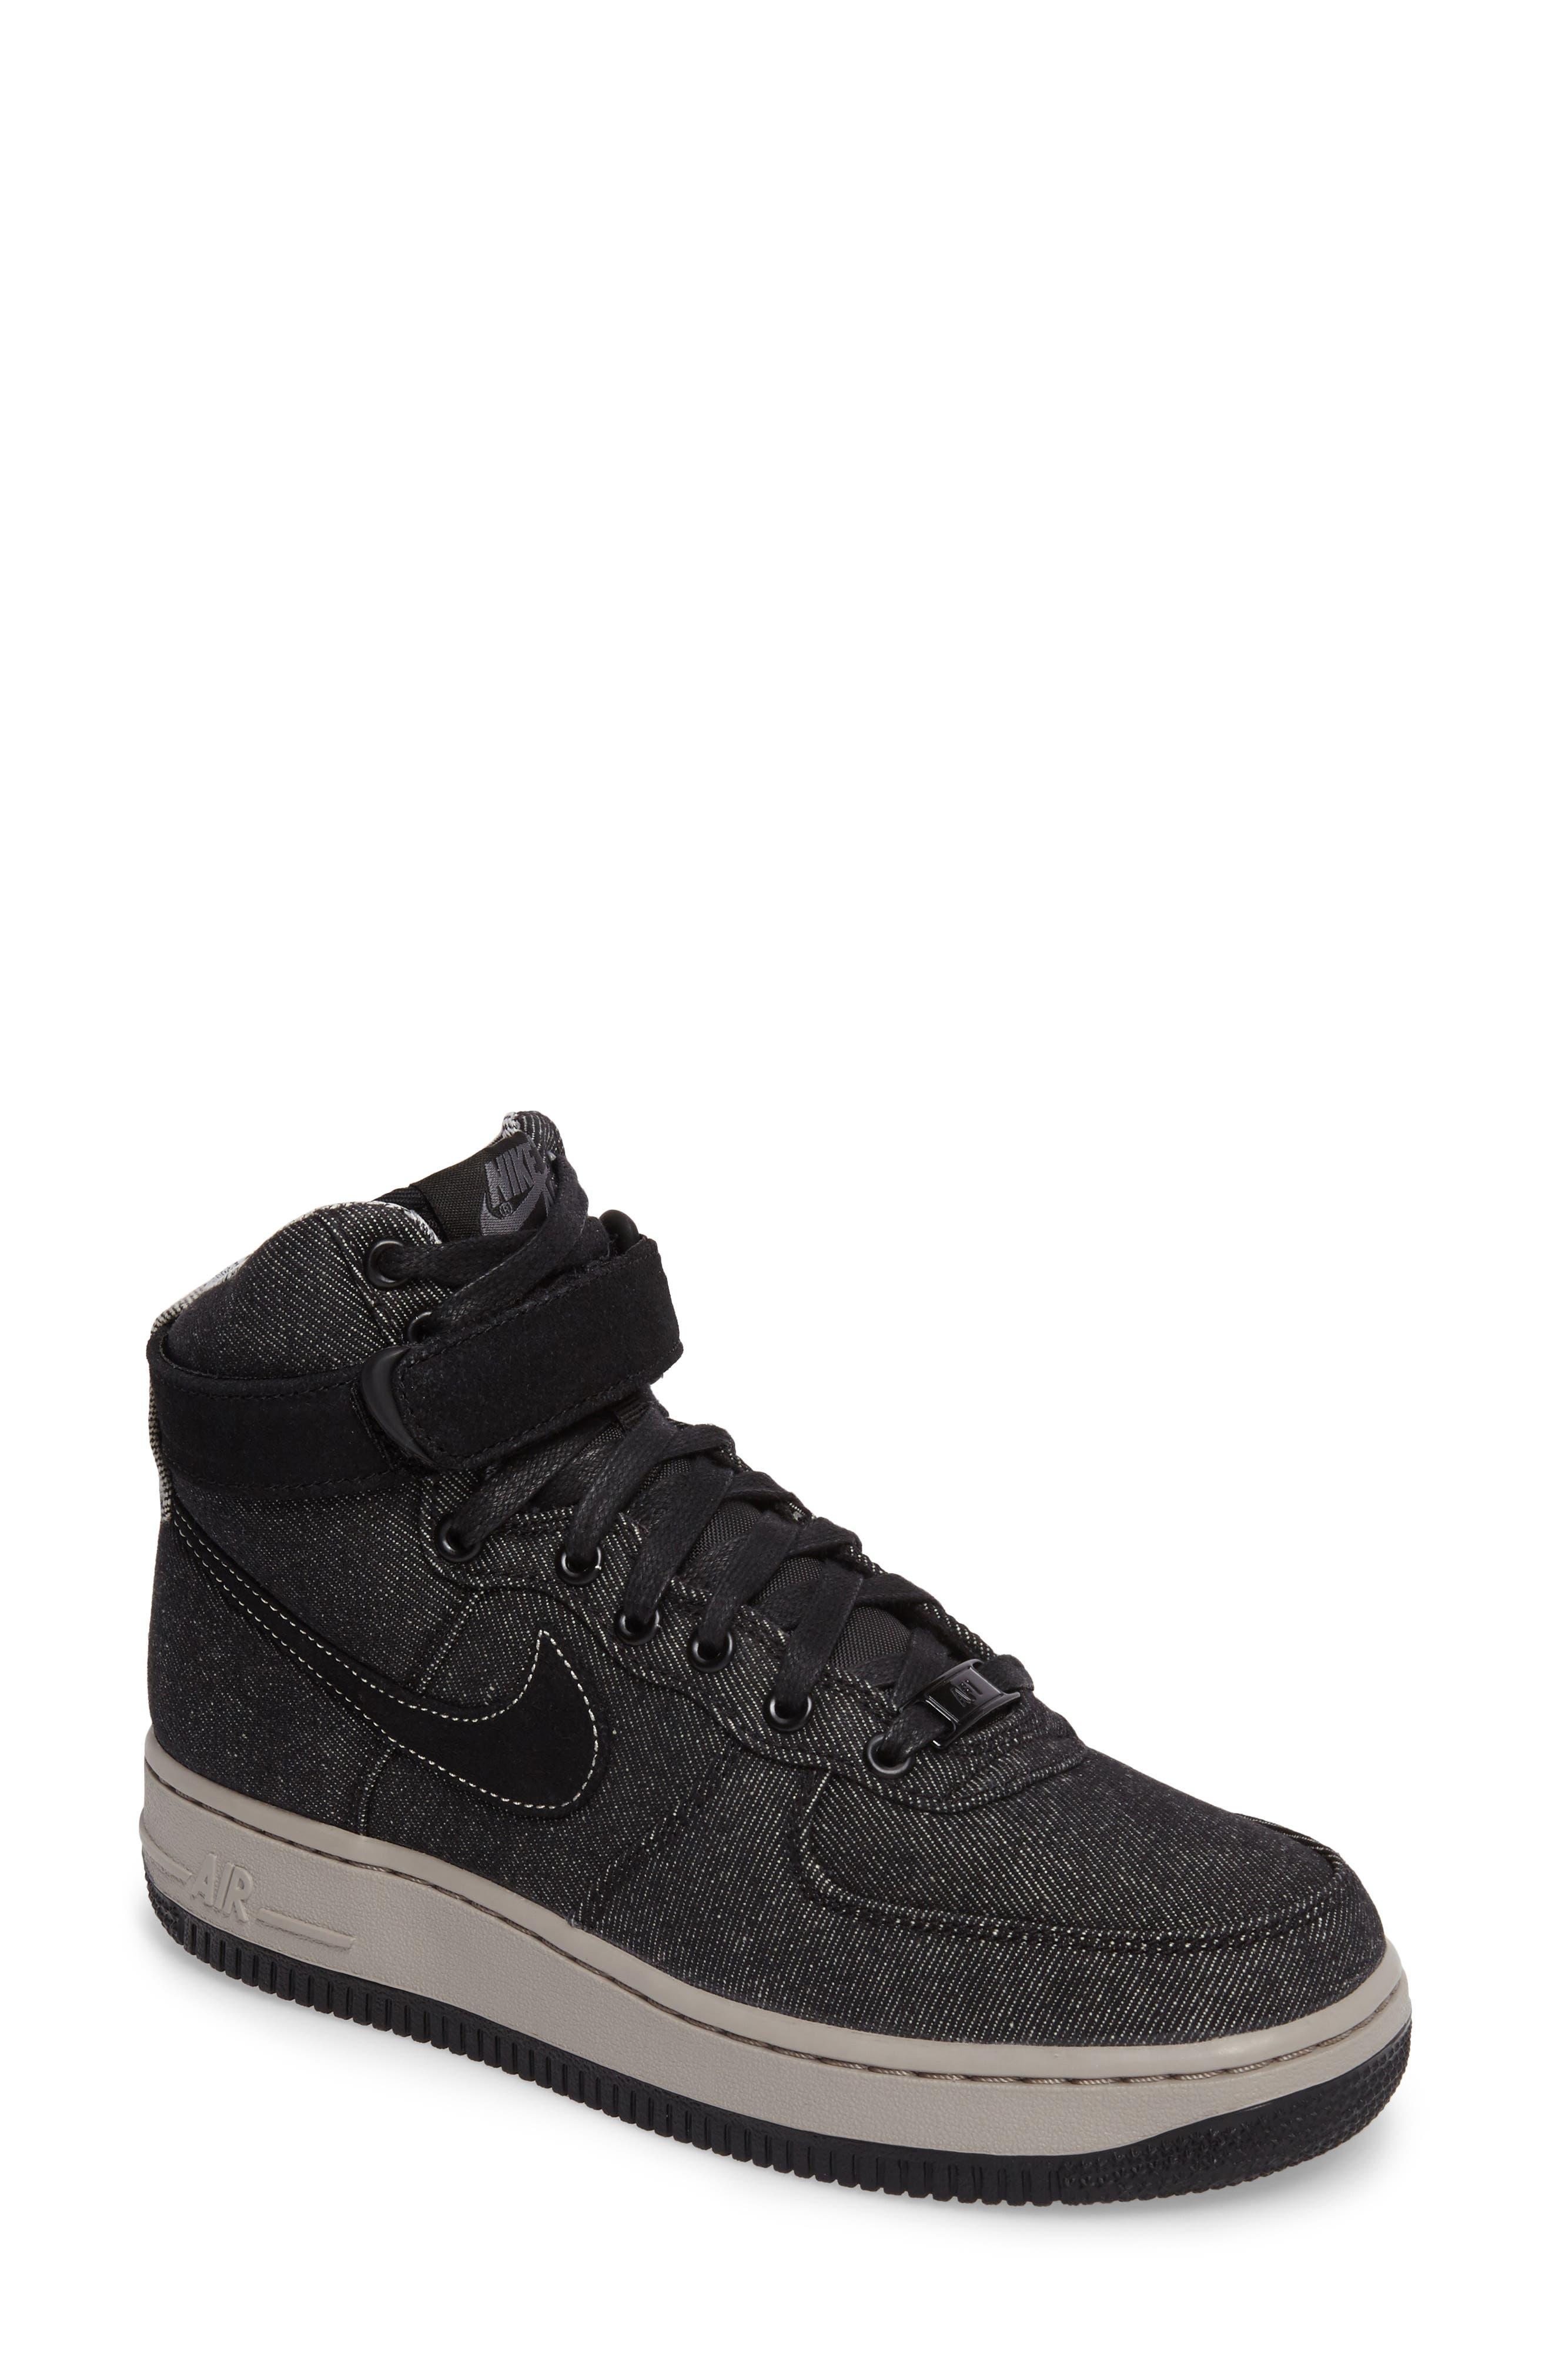 Alternate Image 1 Selected - Nike Air Force 1 High Top SE Sneaker (Women)